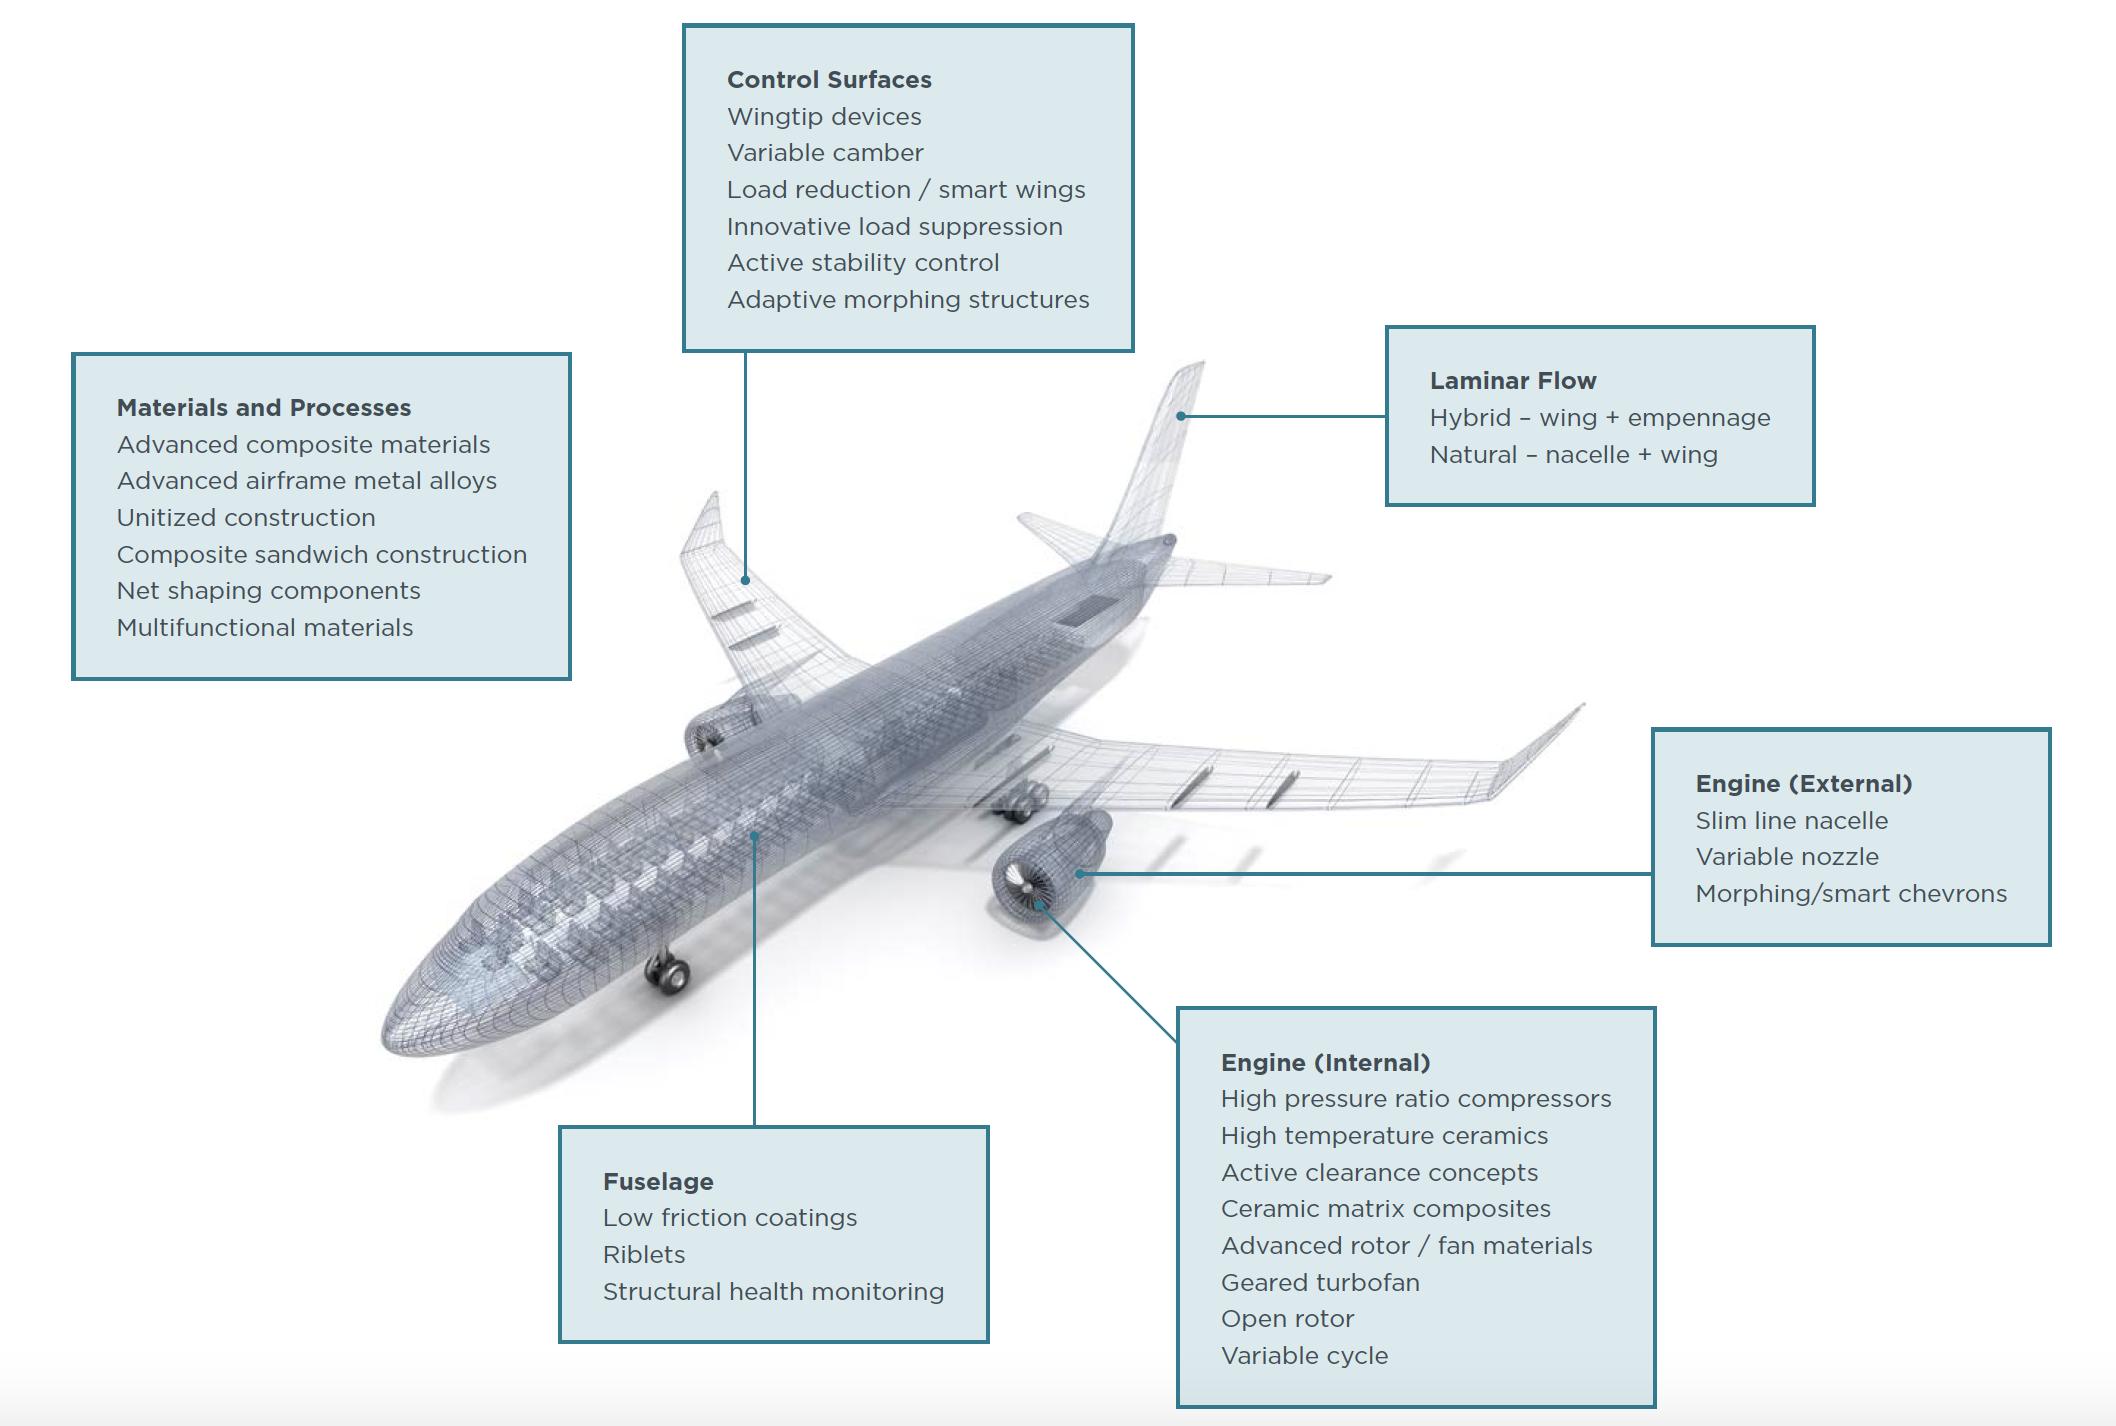 Maximizing aircraft fuel efficiency: Don't skimp on R&D